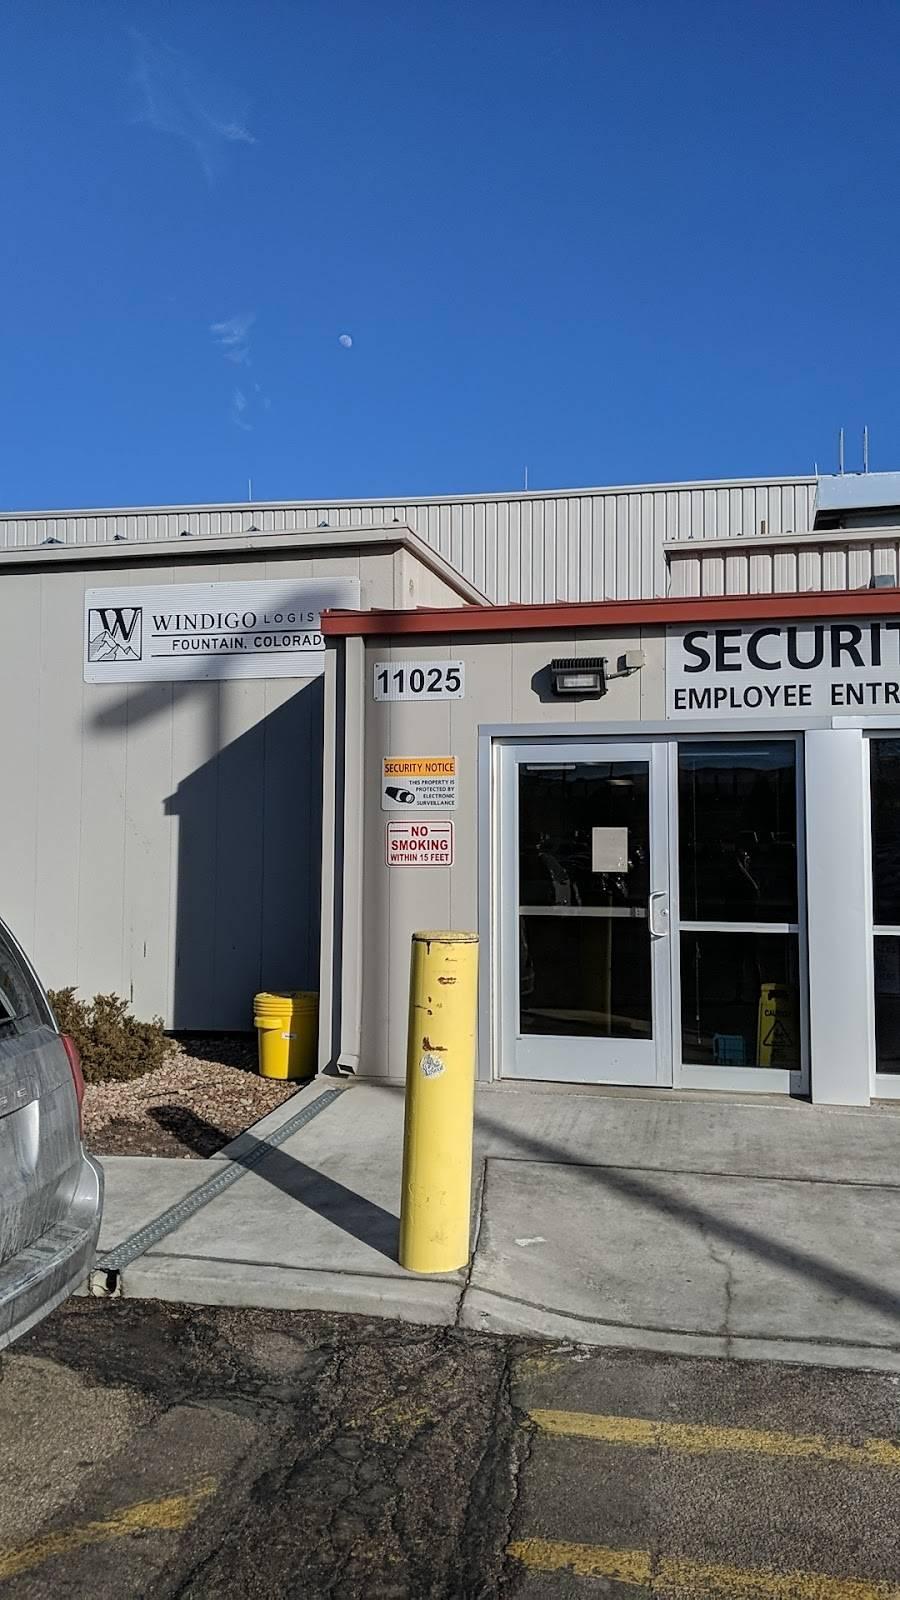 Windigo Logistics - storage    Photo 9 of 9   Address: 11025 Charter Oak Ranch Rd, Fountain, CO 80817, USA   Phone: (719) 382-1800